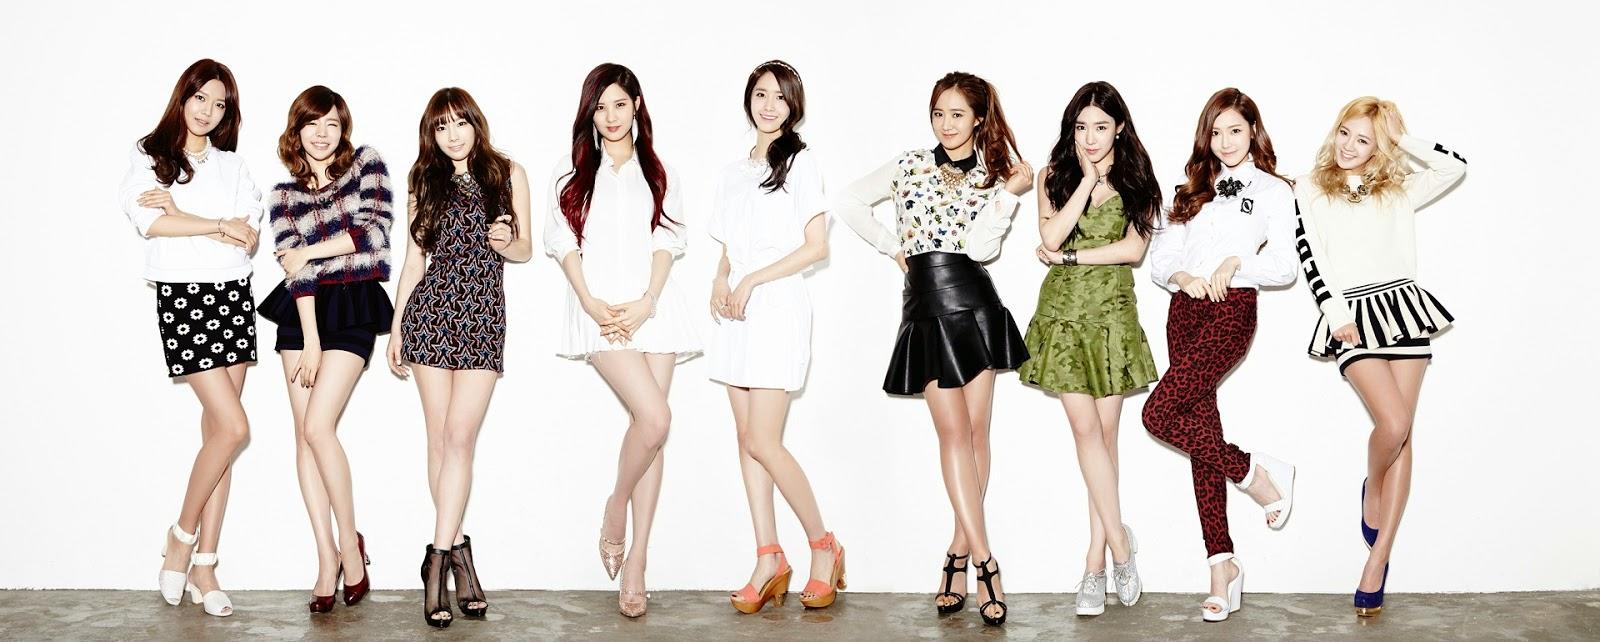 girls generation hd - photo #19